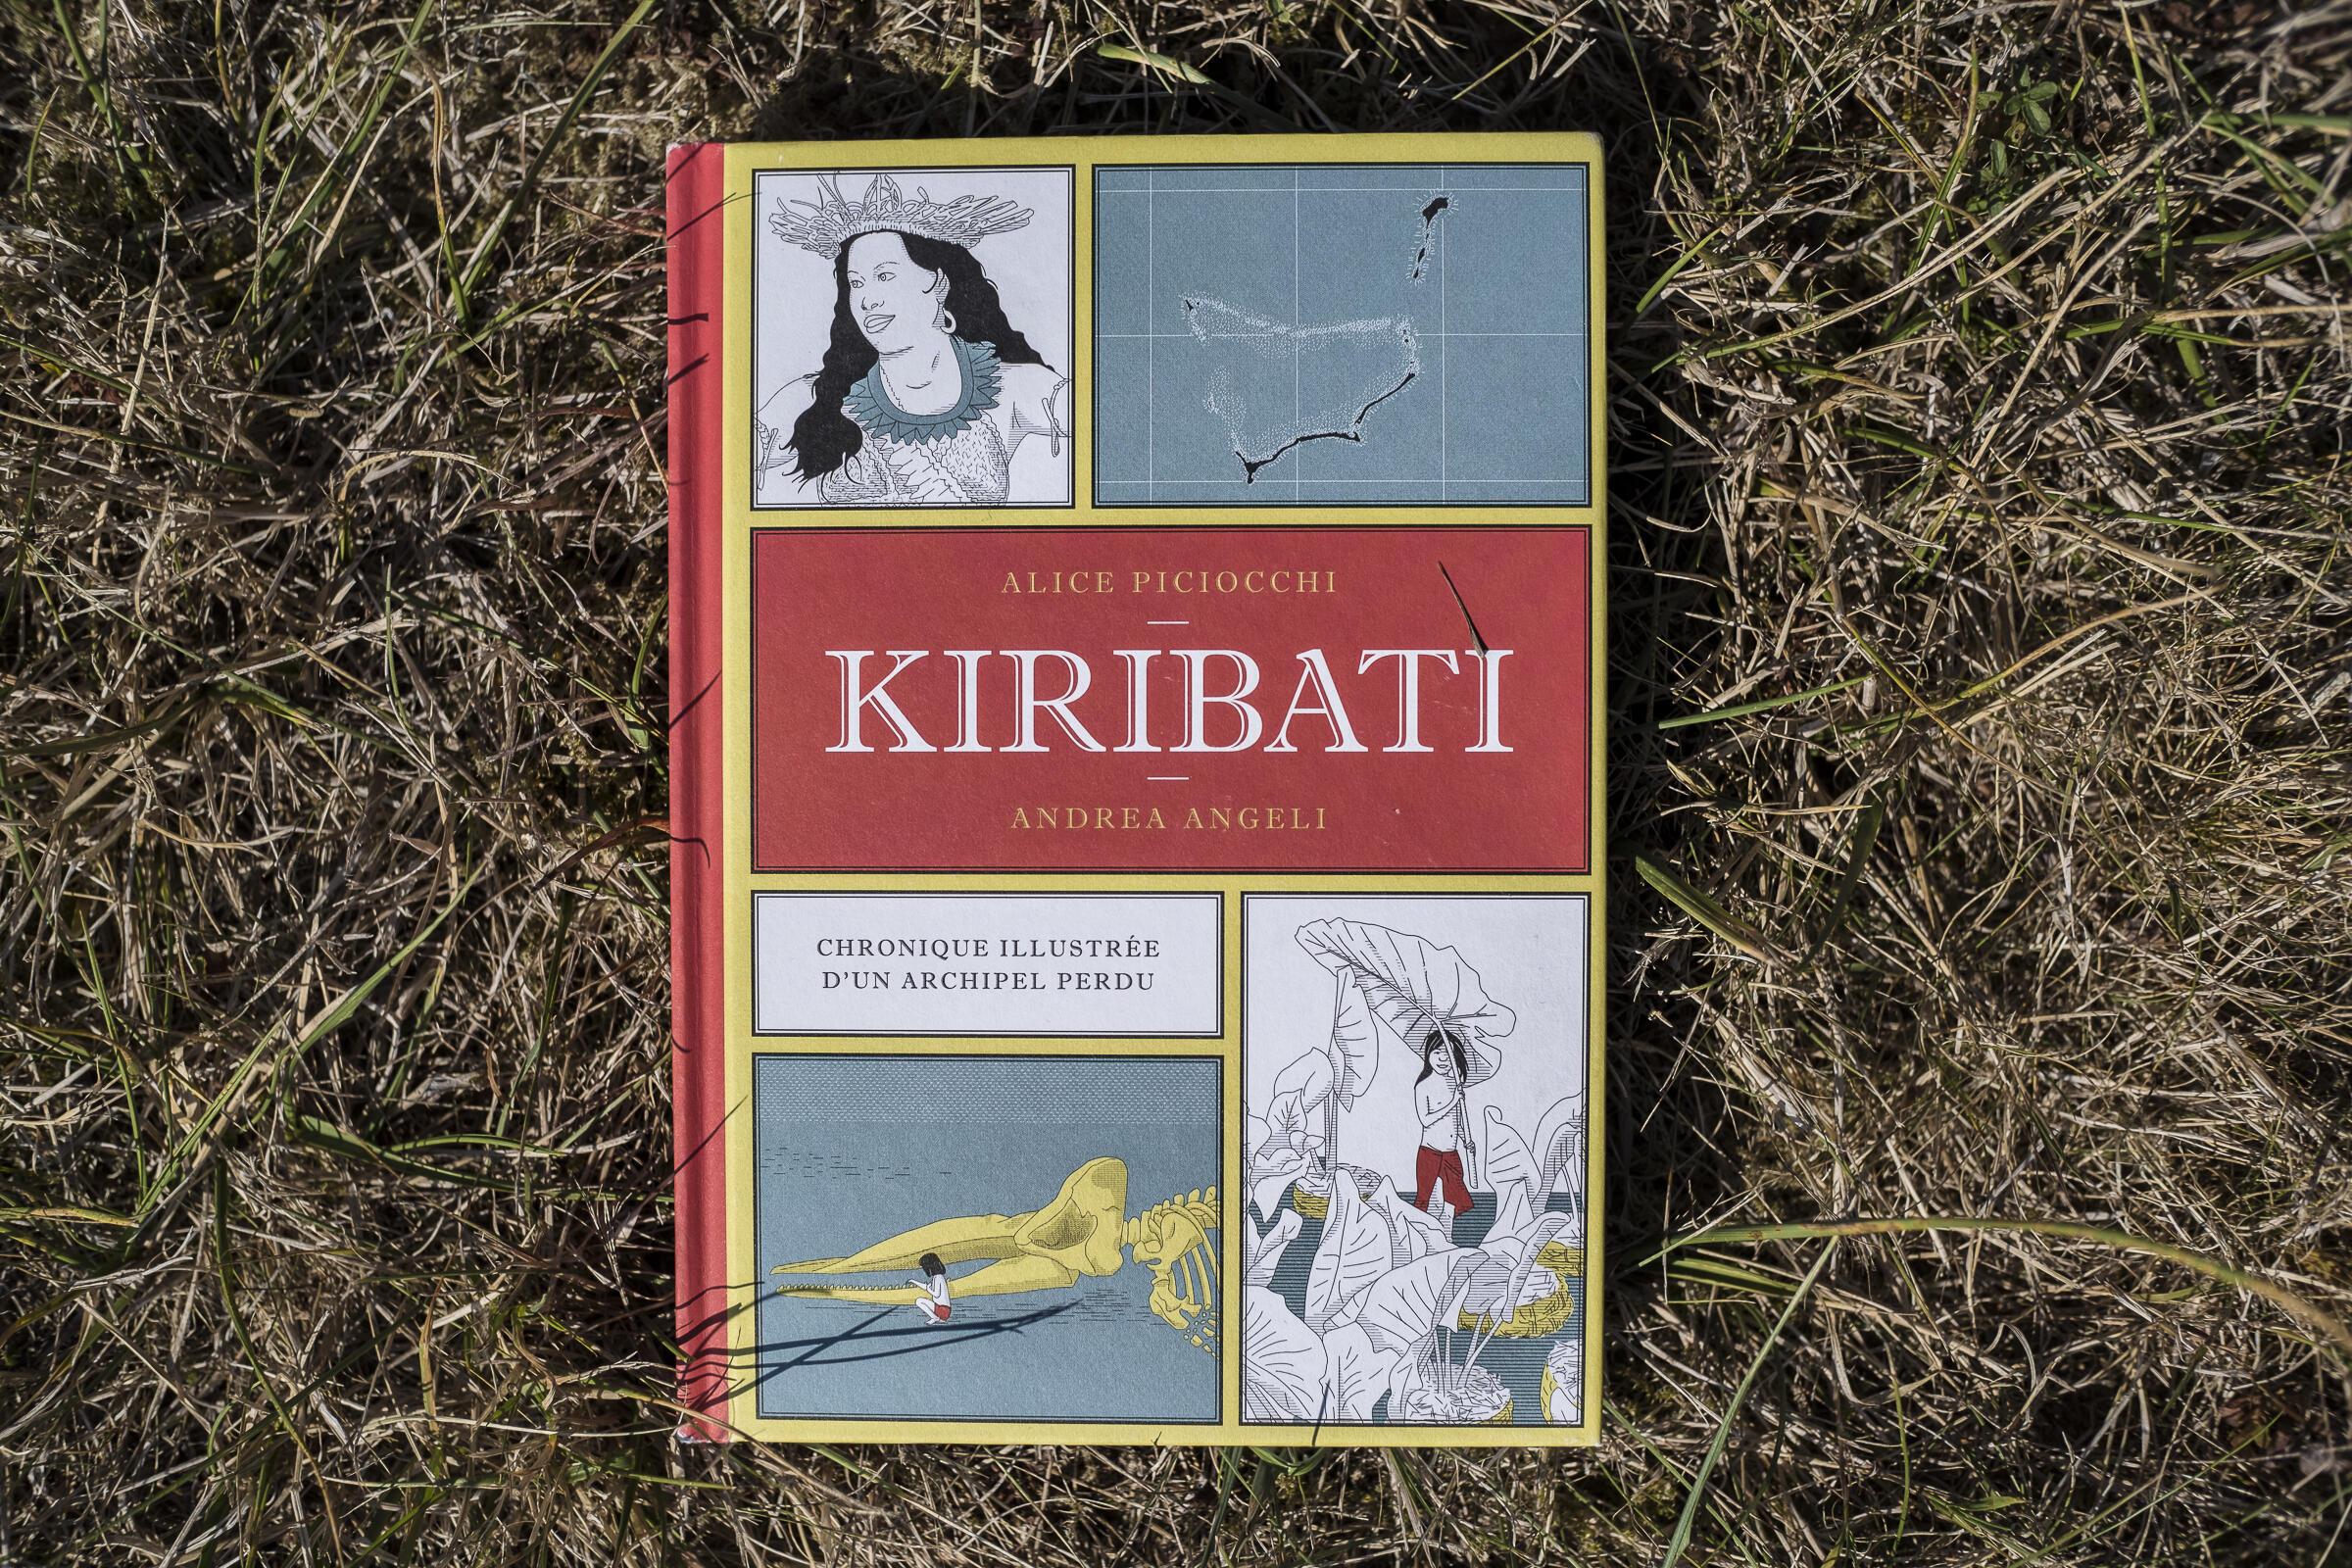 Kiribati, Chronique illustrée d'un archipel perdu, d'Alice Piciocchi et Andrea Angeli.